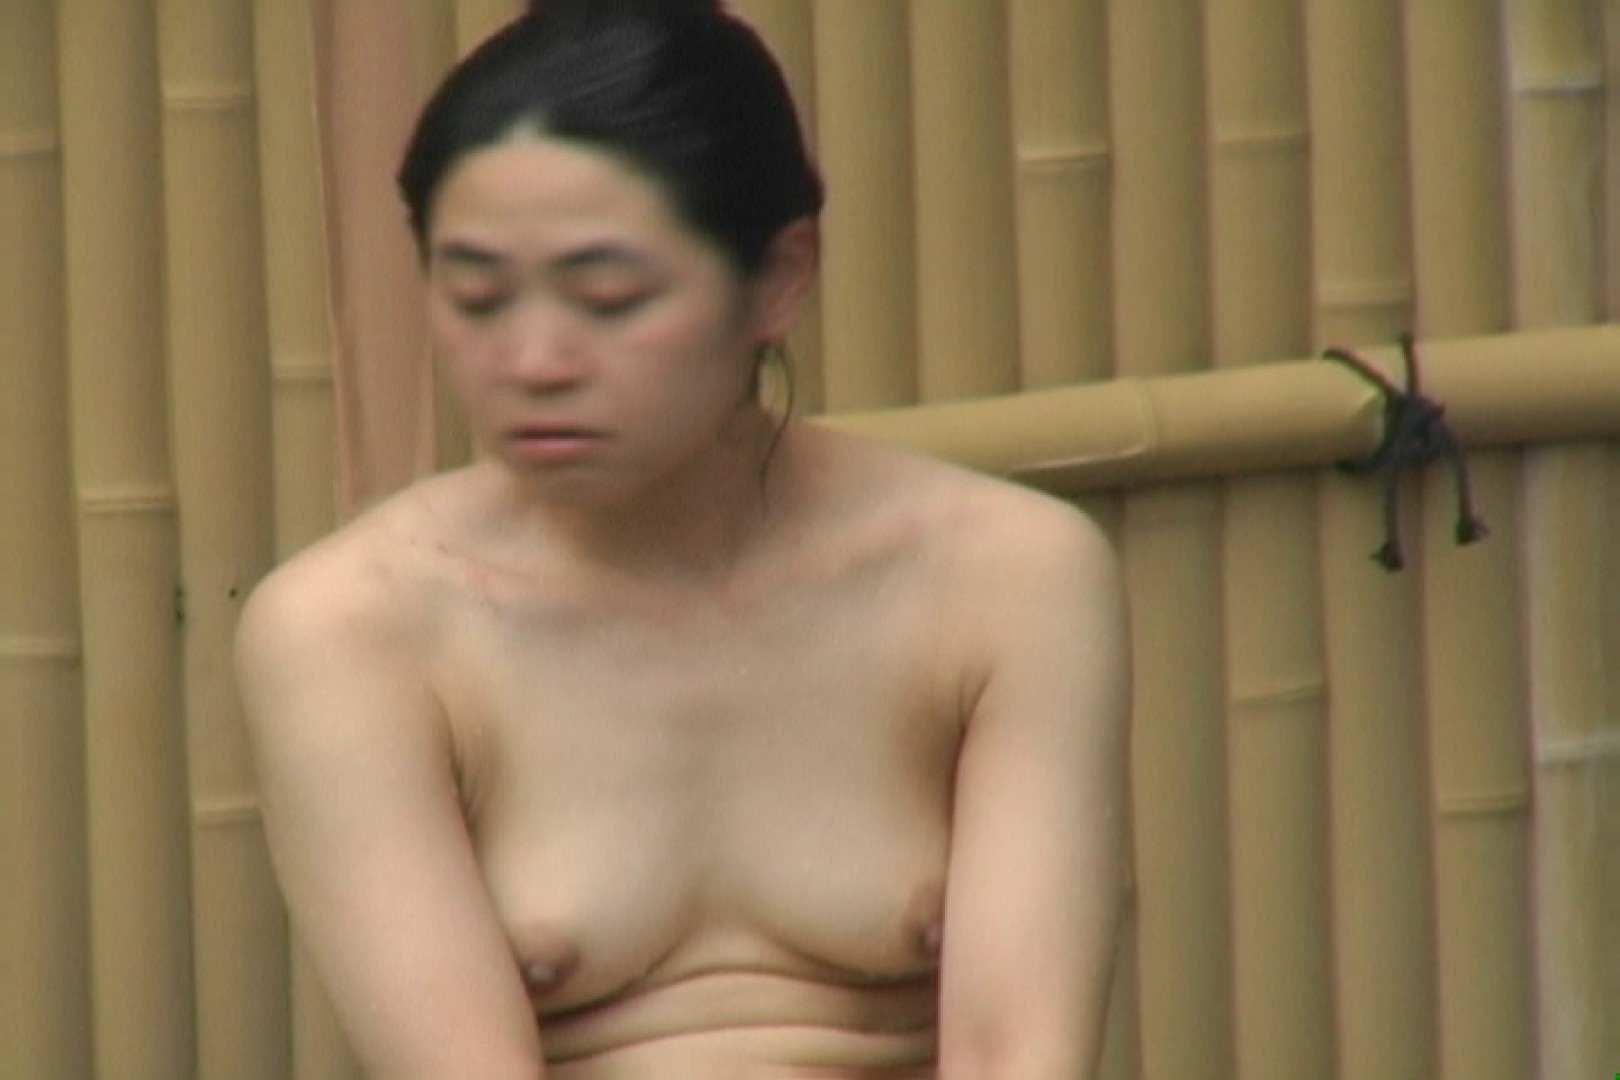 Aquaな露天風呂Vol.623 盗撮 SEX無修正画像 97画像 29